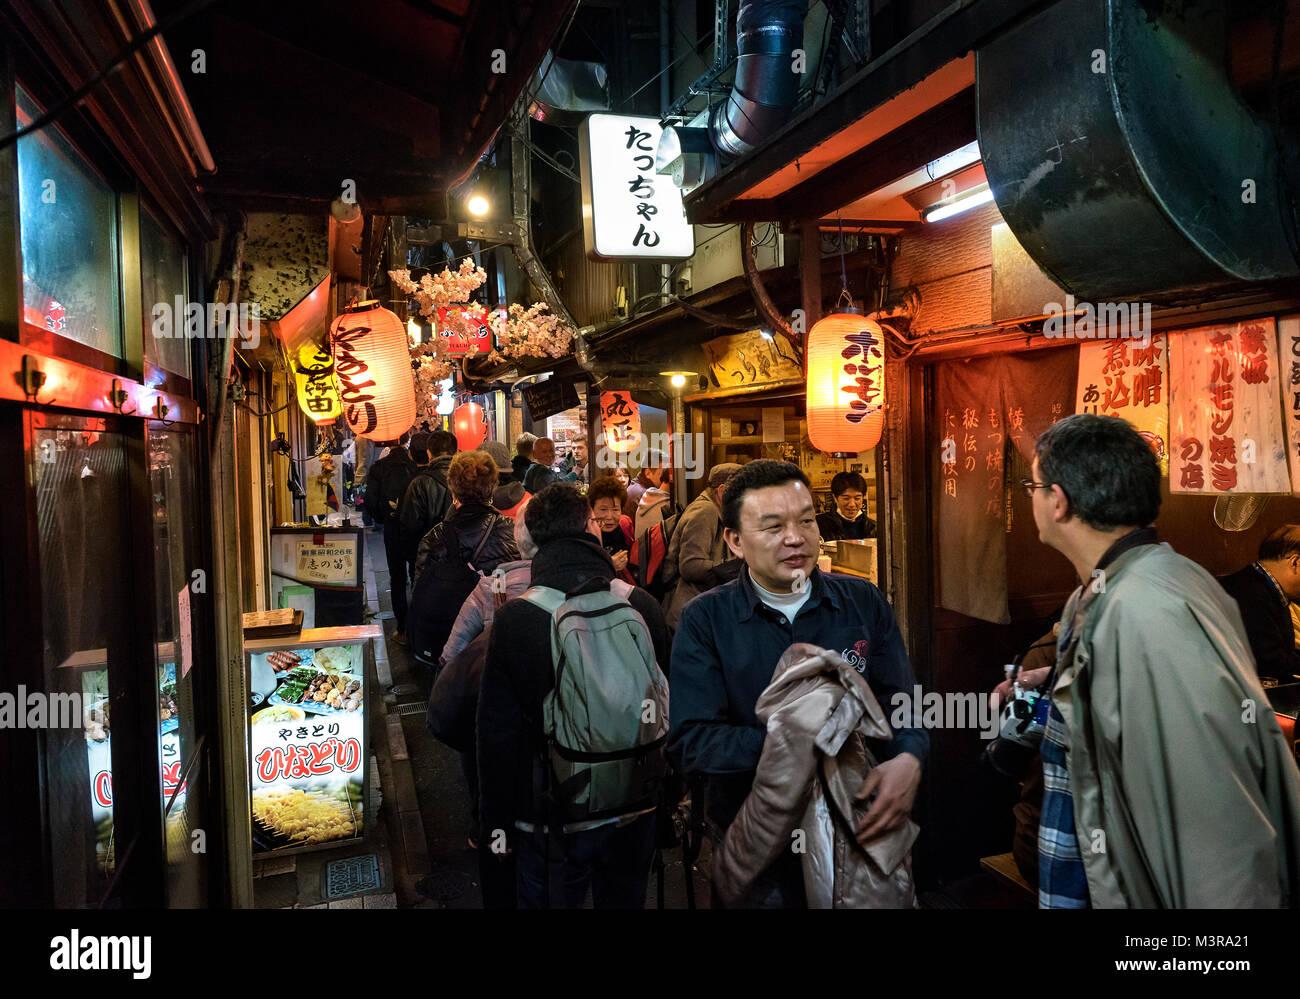 Japan, Honshu island, Kanto, Tokyo, by the streets of Omoide Yokocho a night - Stock Image